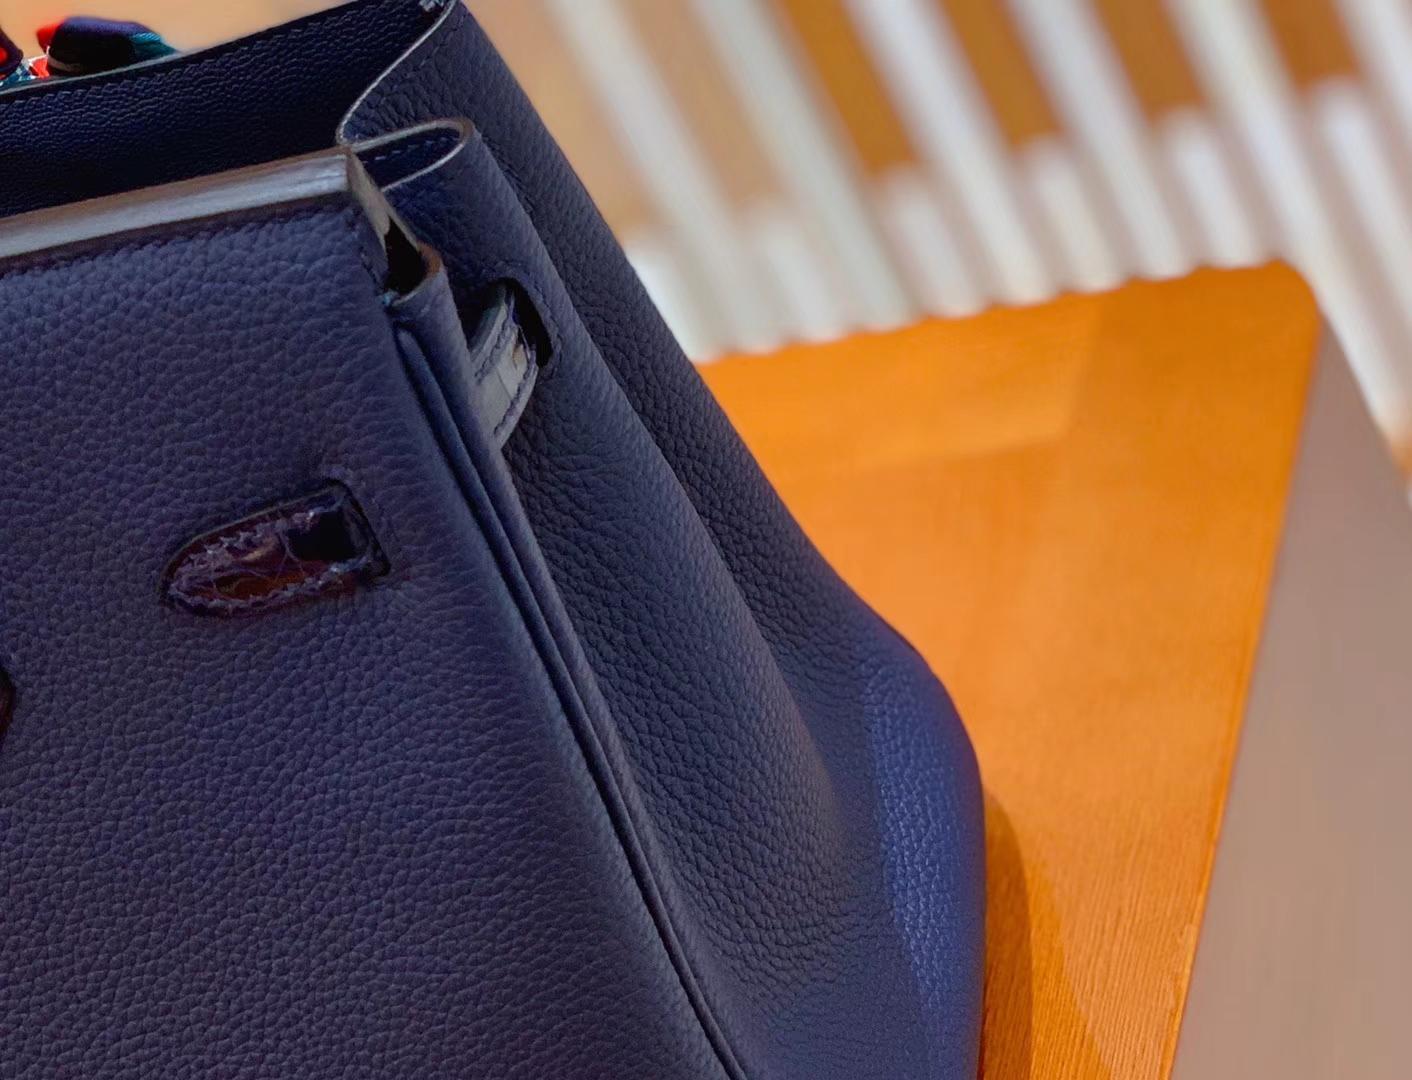 Hermès(爱马仕)Birkin 铂金包 深蓝色 Touch 牛皮拼鳄鱼皮 金扣 25cm